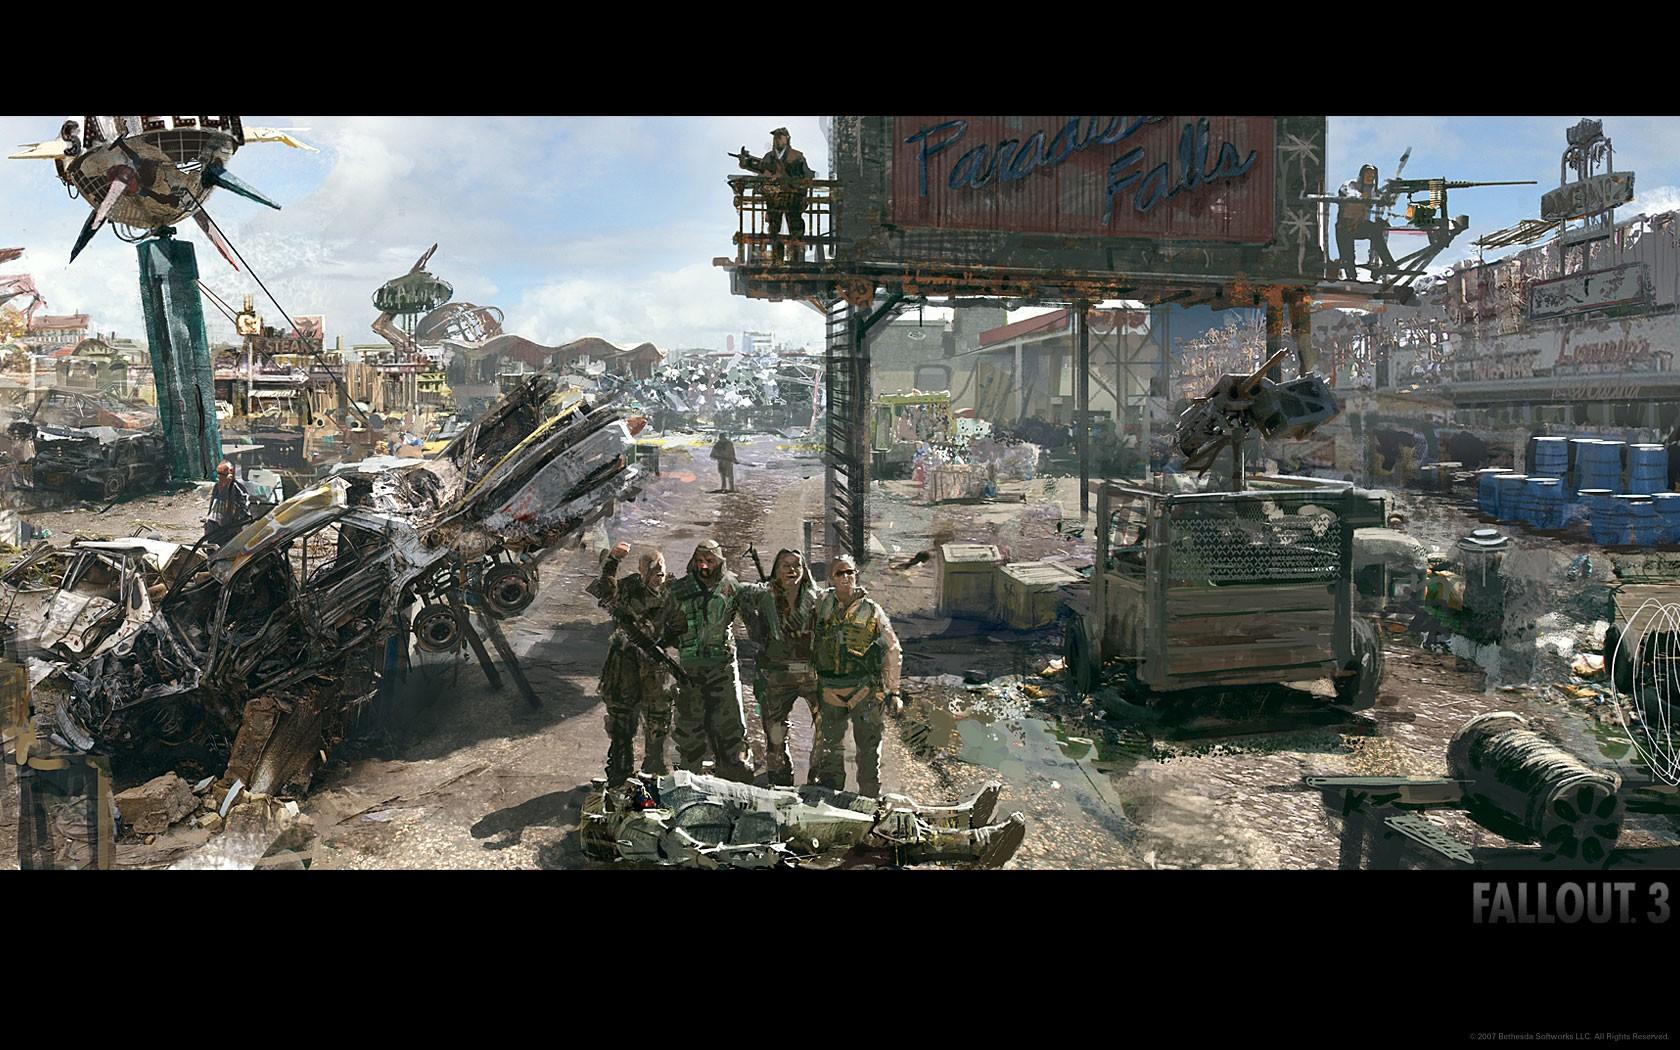 Fallout 3 rencontres aleatoires